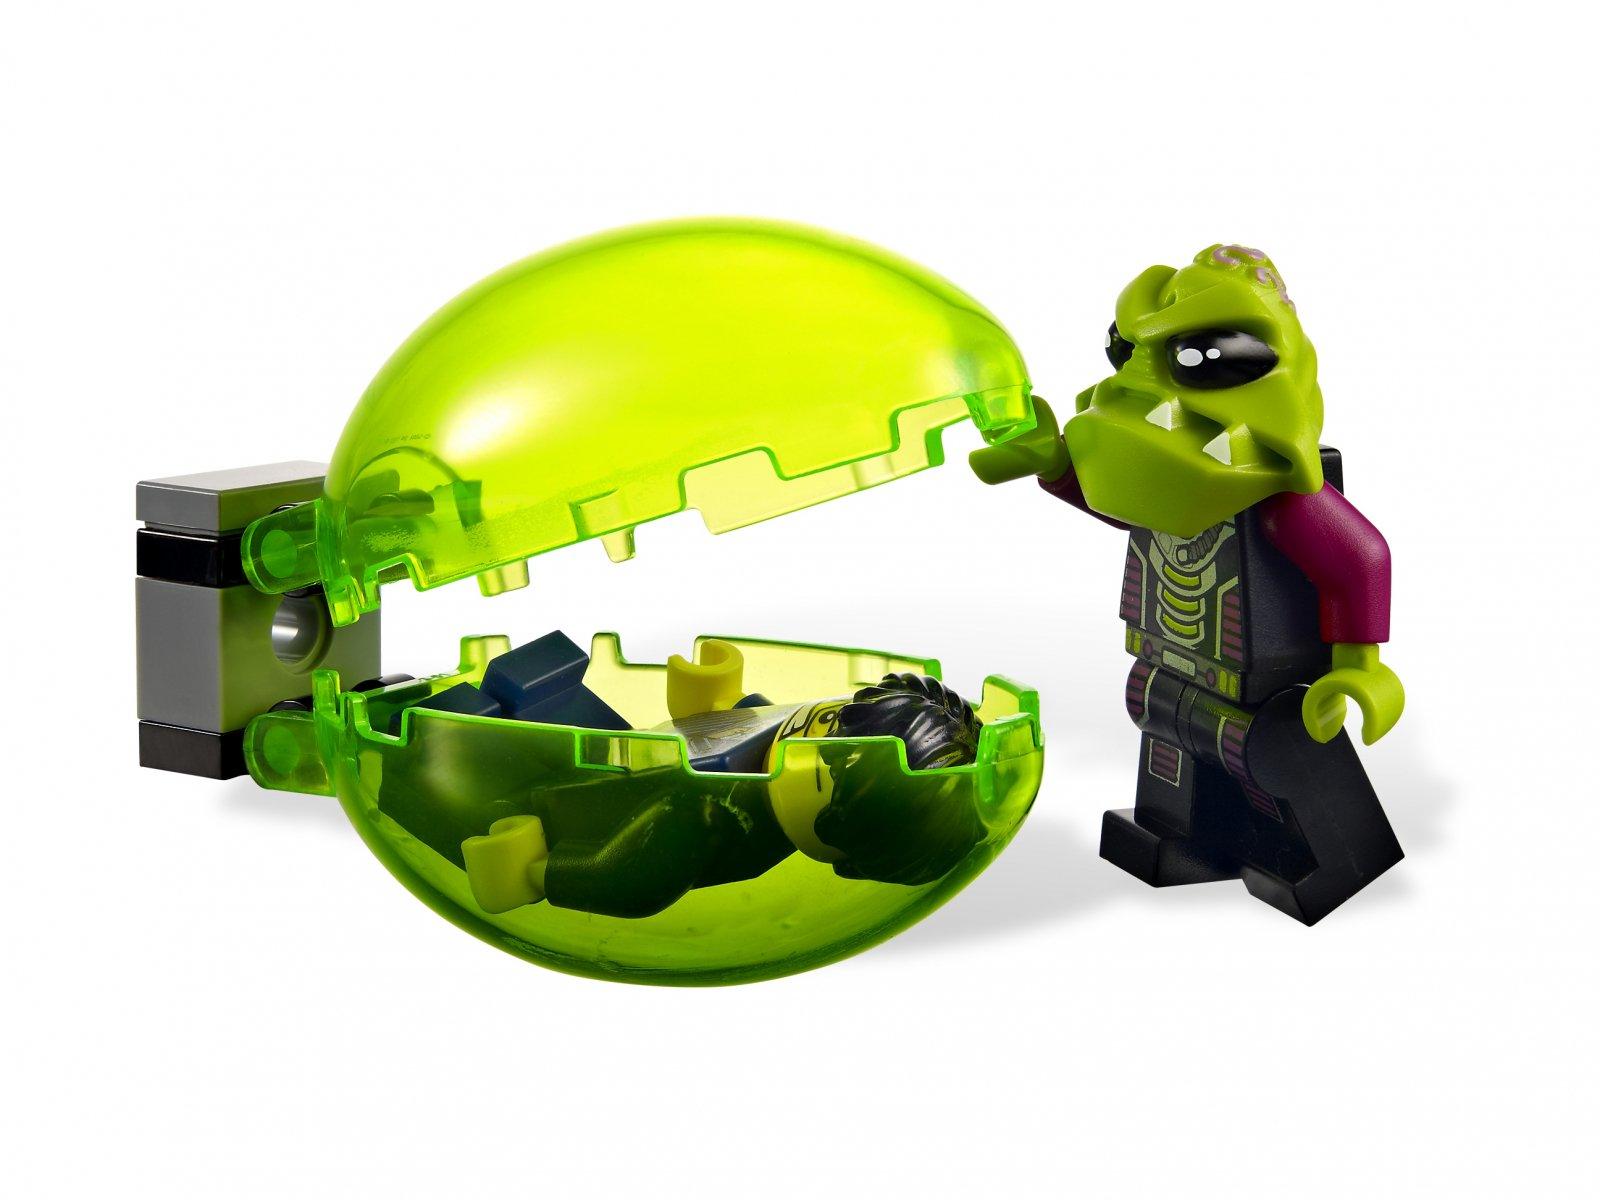 LEGO 7051 Alien Conquest Tripod Invader